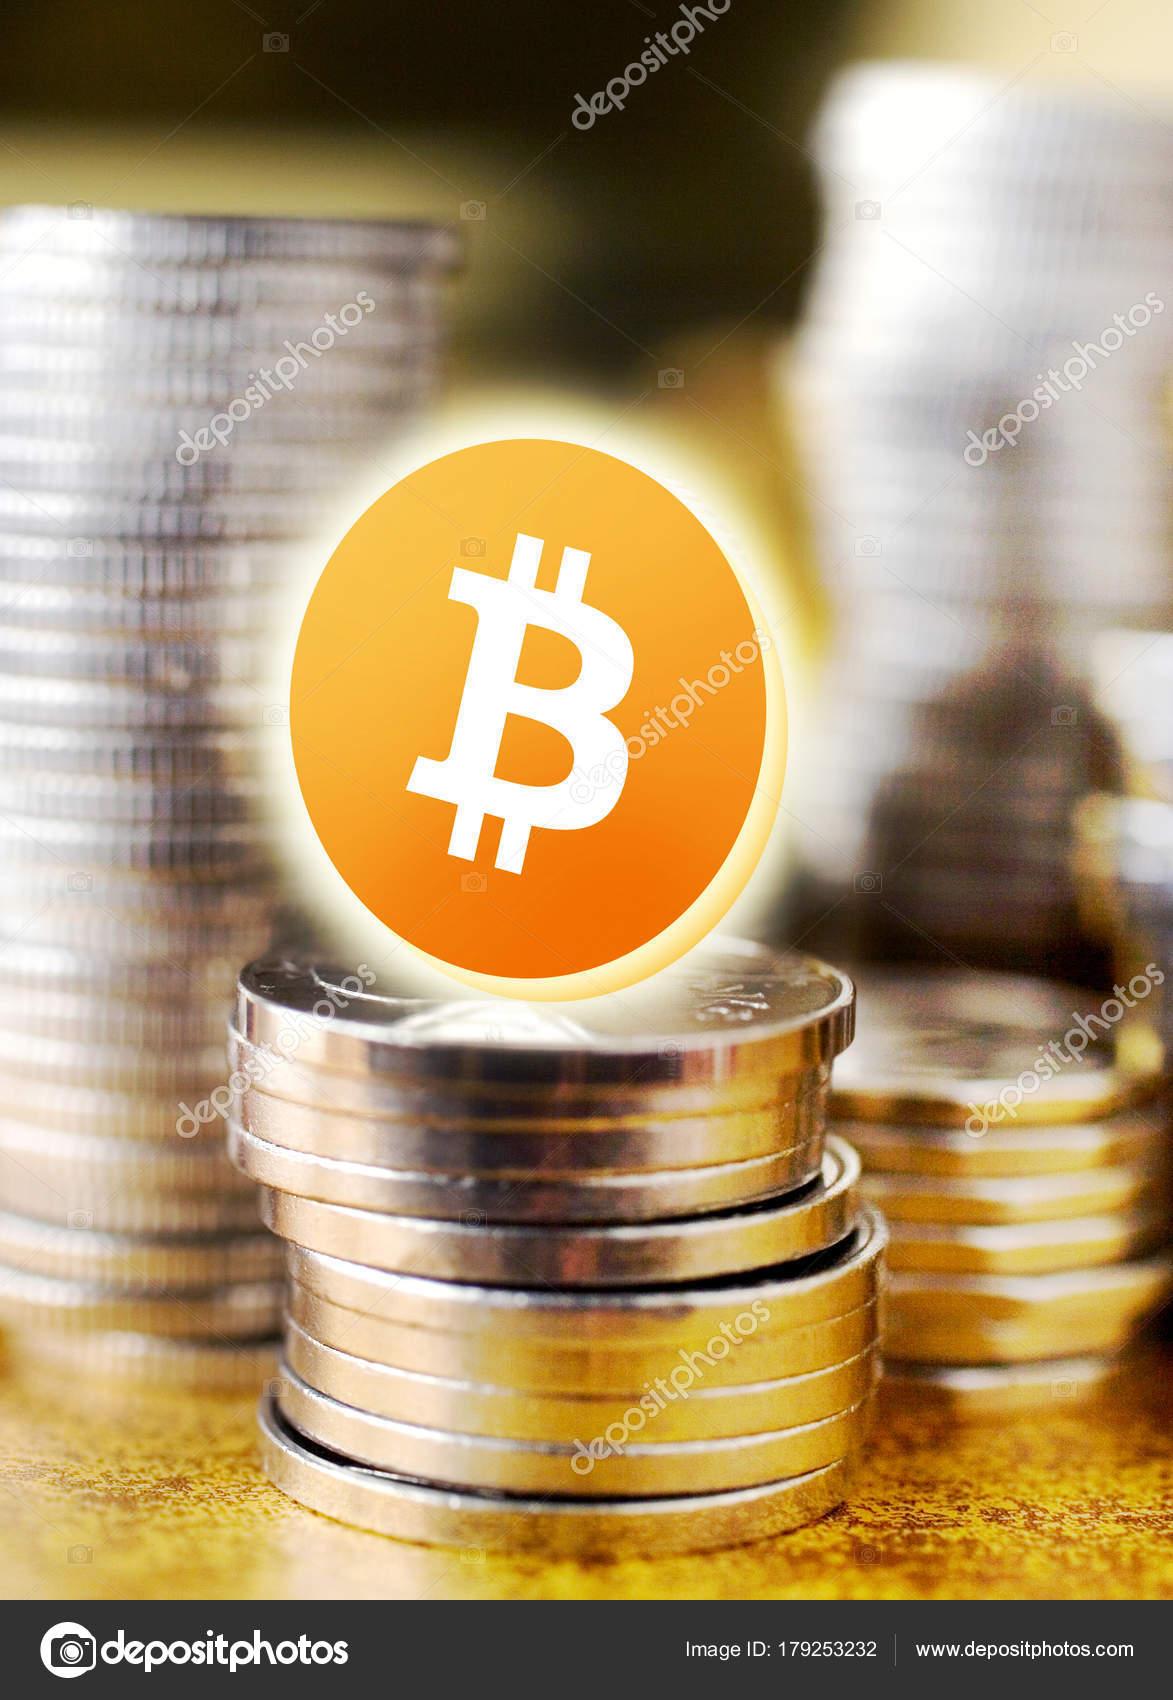 Cara hack bitcoins worth 2 hot 2 handle trifecta betting